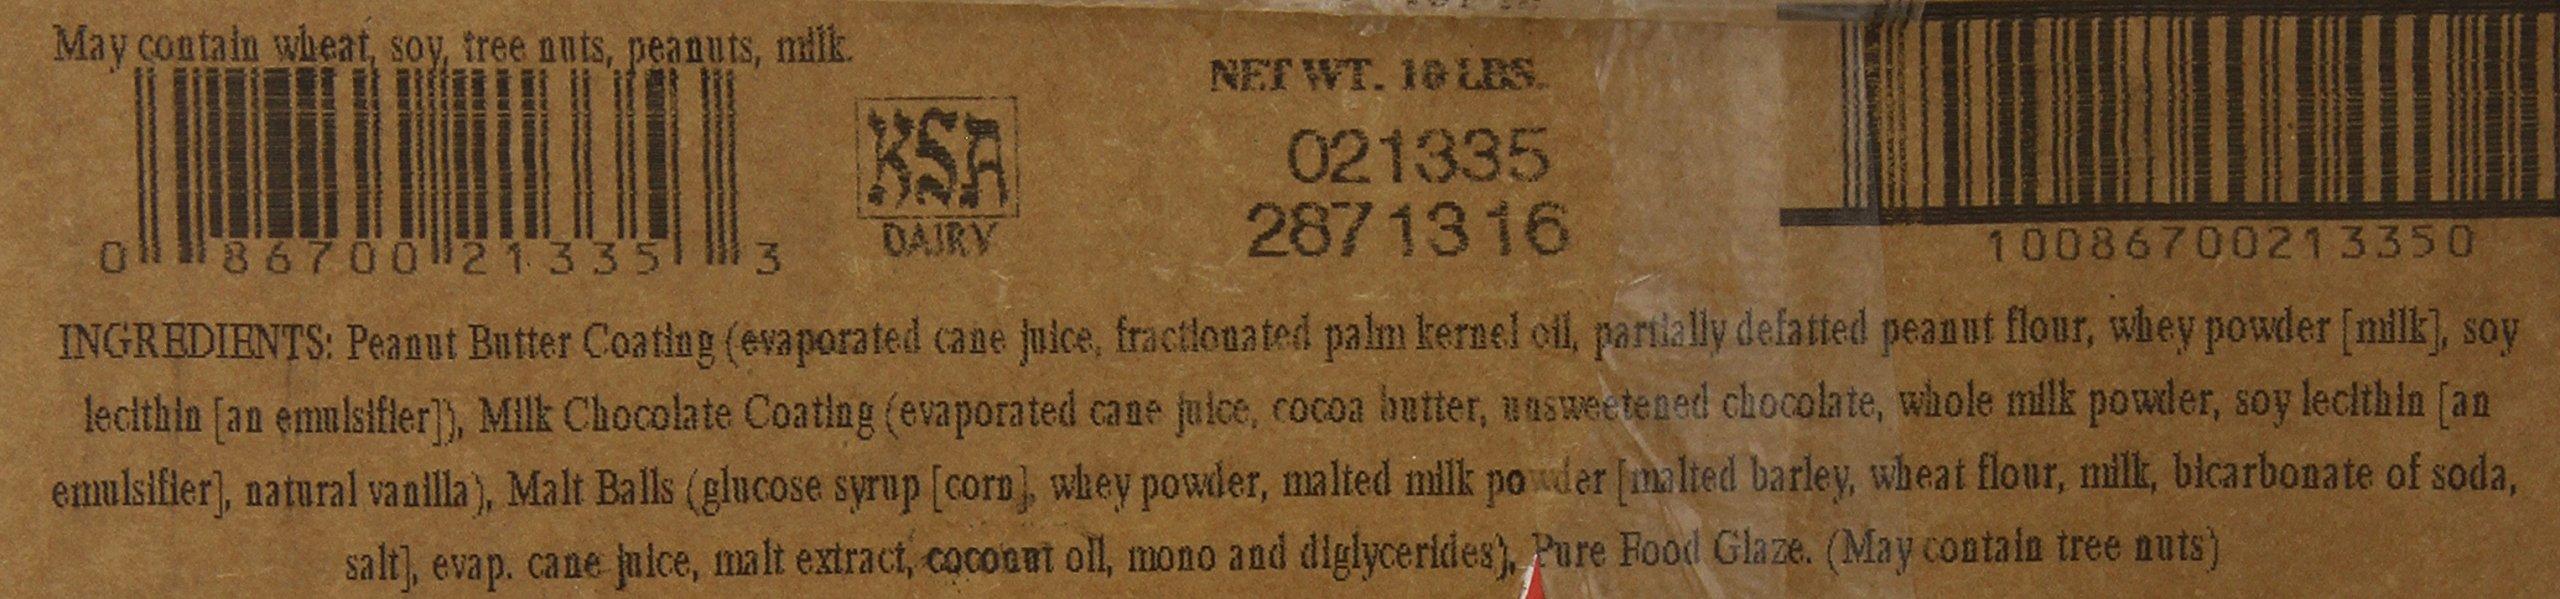 Sunridge Farms Candy, Peanut Butter Chocolate Malt Balls, 10 Pound by SunRidge Farms